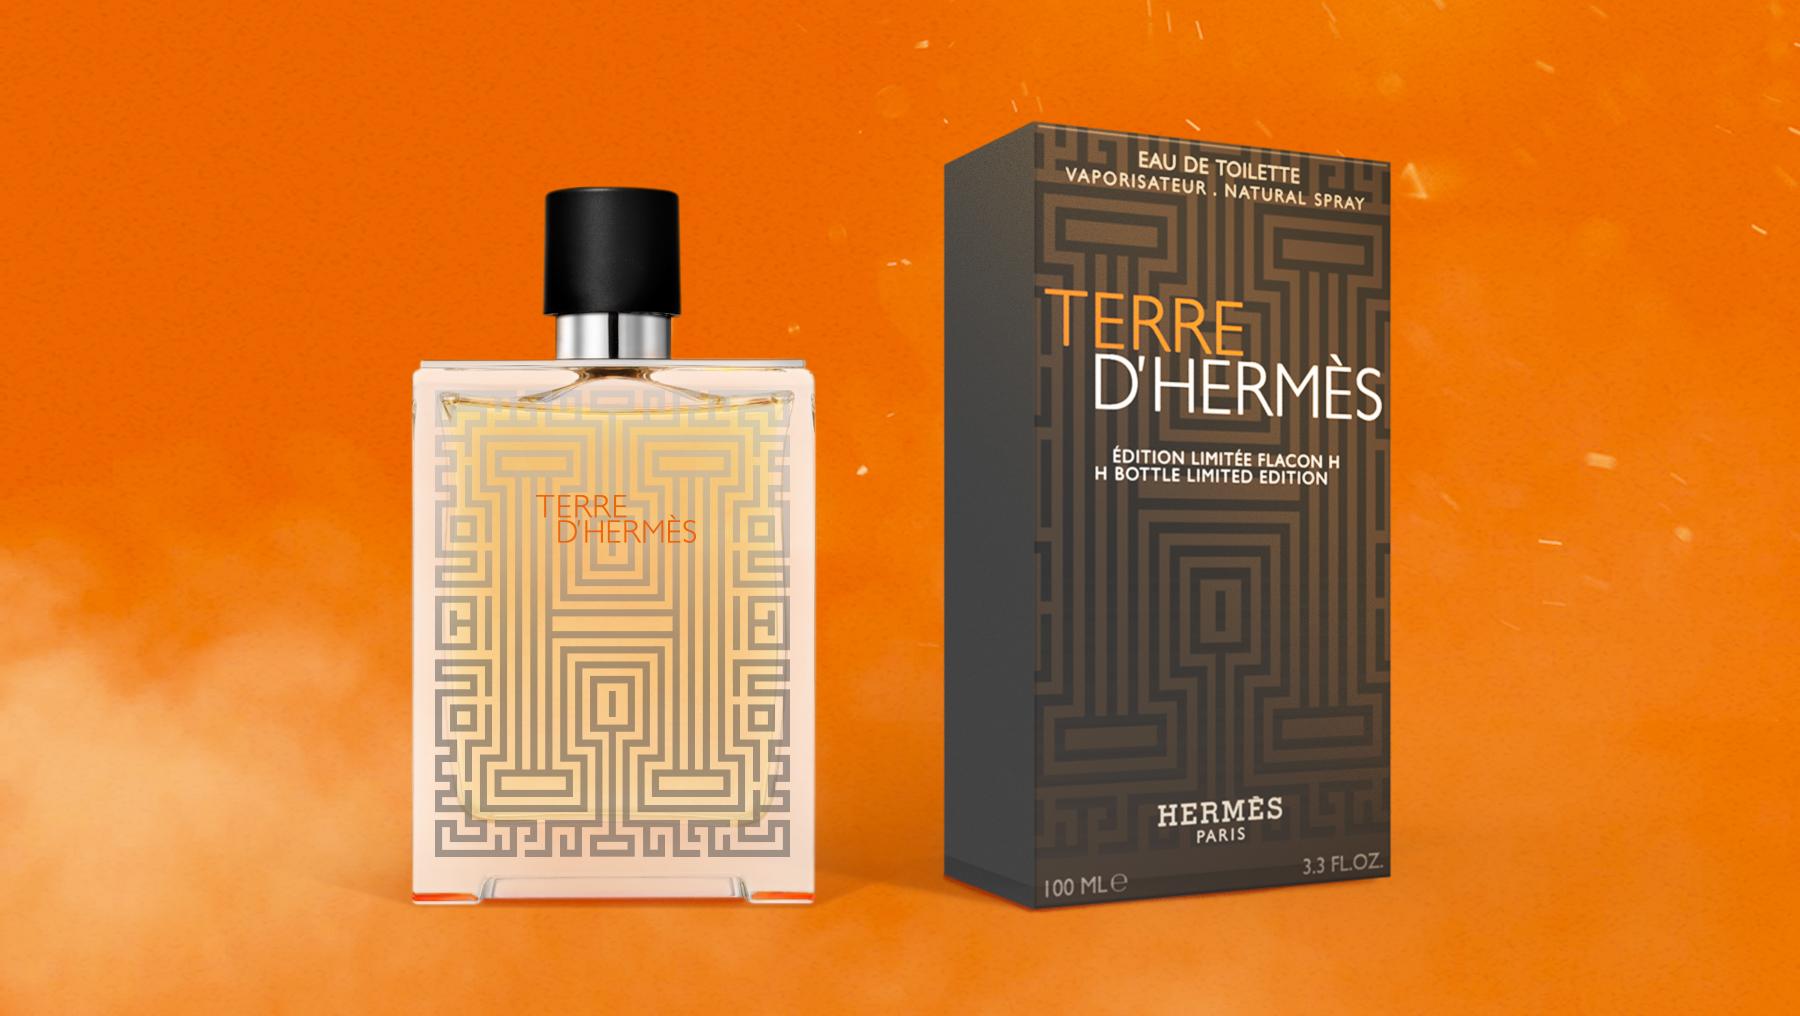 D'hermès Competition Limited On Behance Terre Edition tdxBQChsr